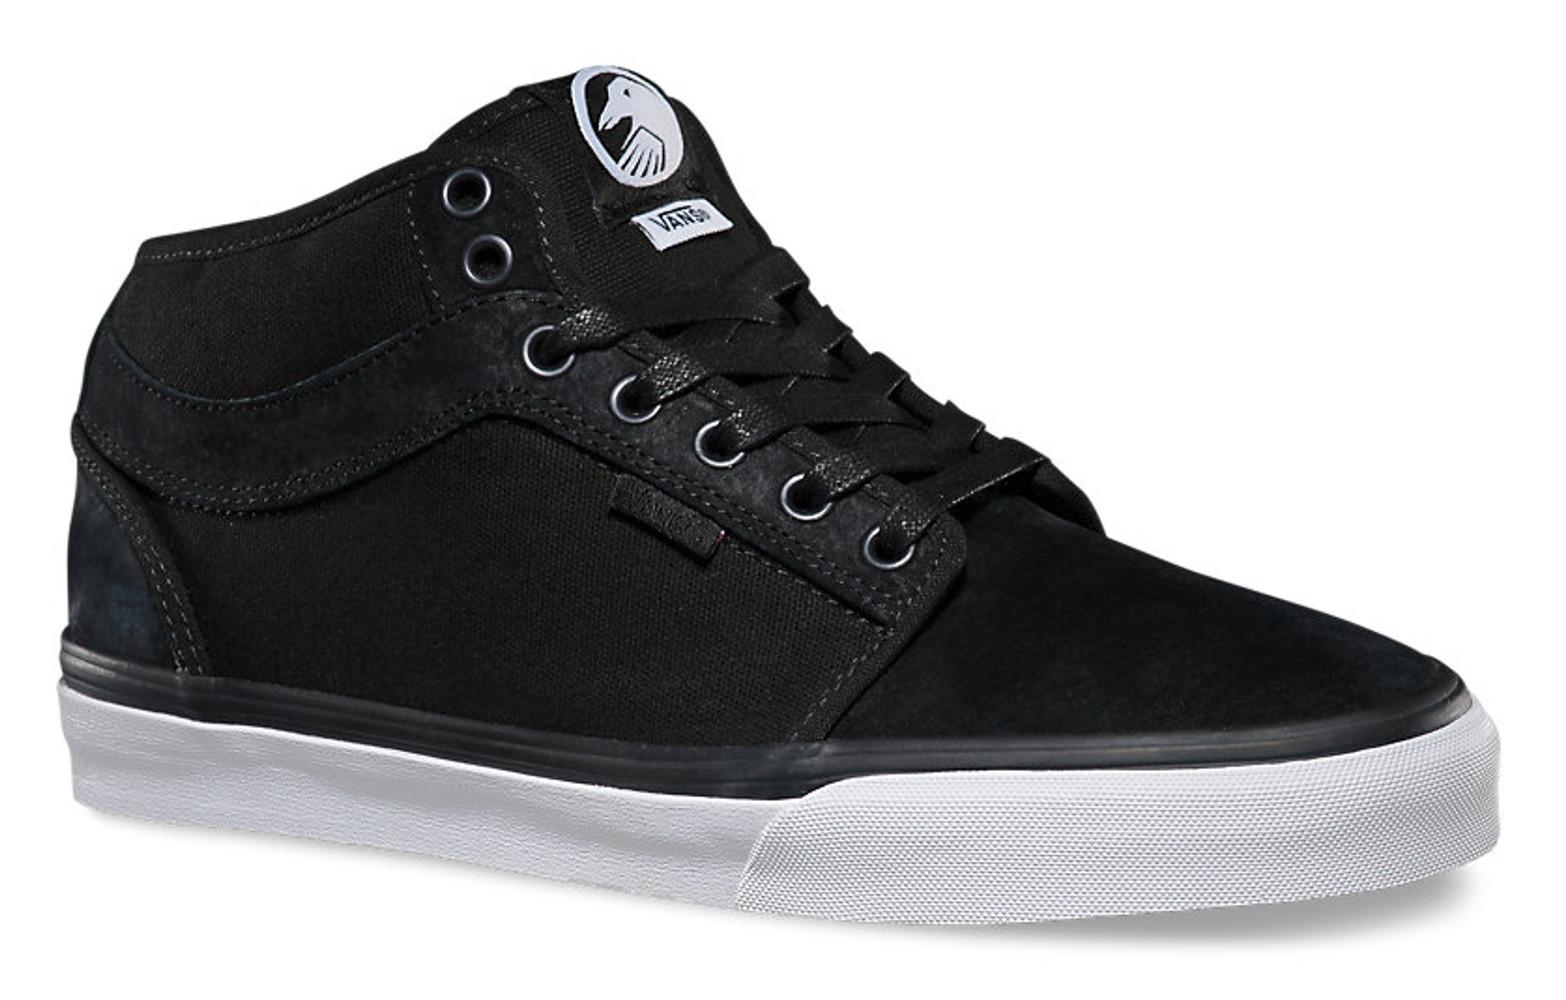 0efb353f431d49 Chukka Chaussures Bmx Shadow Midtop Vans Noir dCorxBe